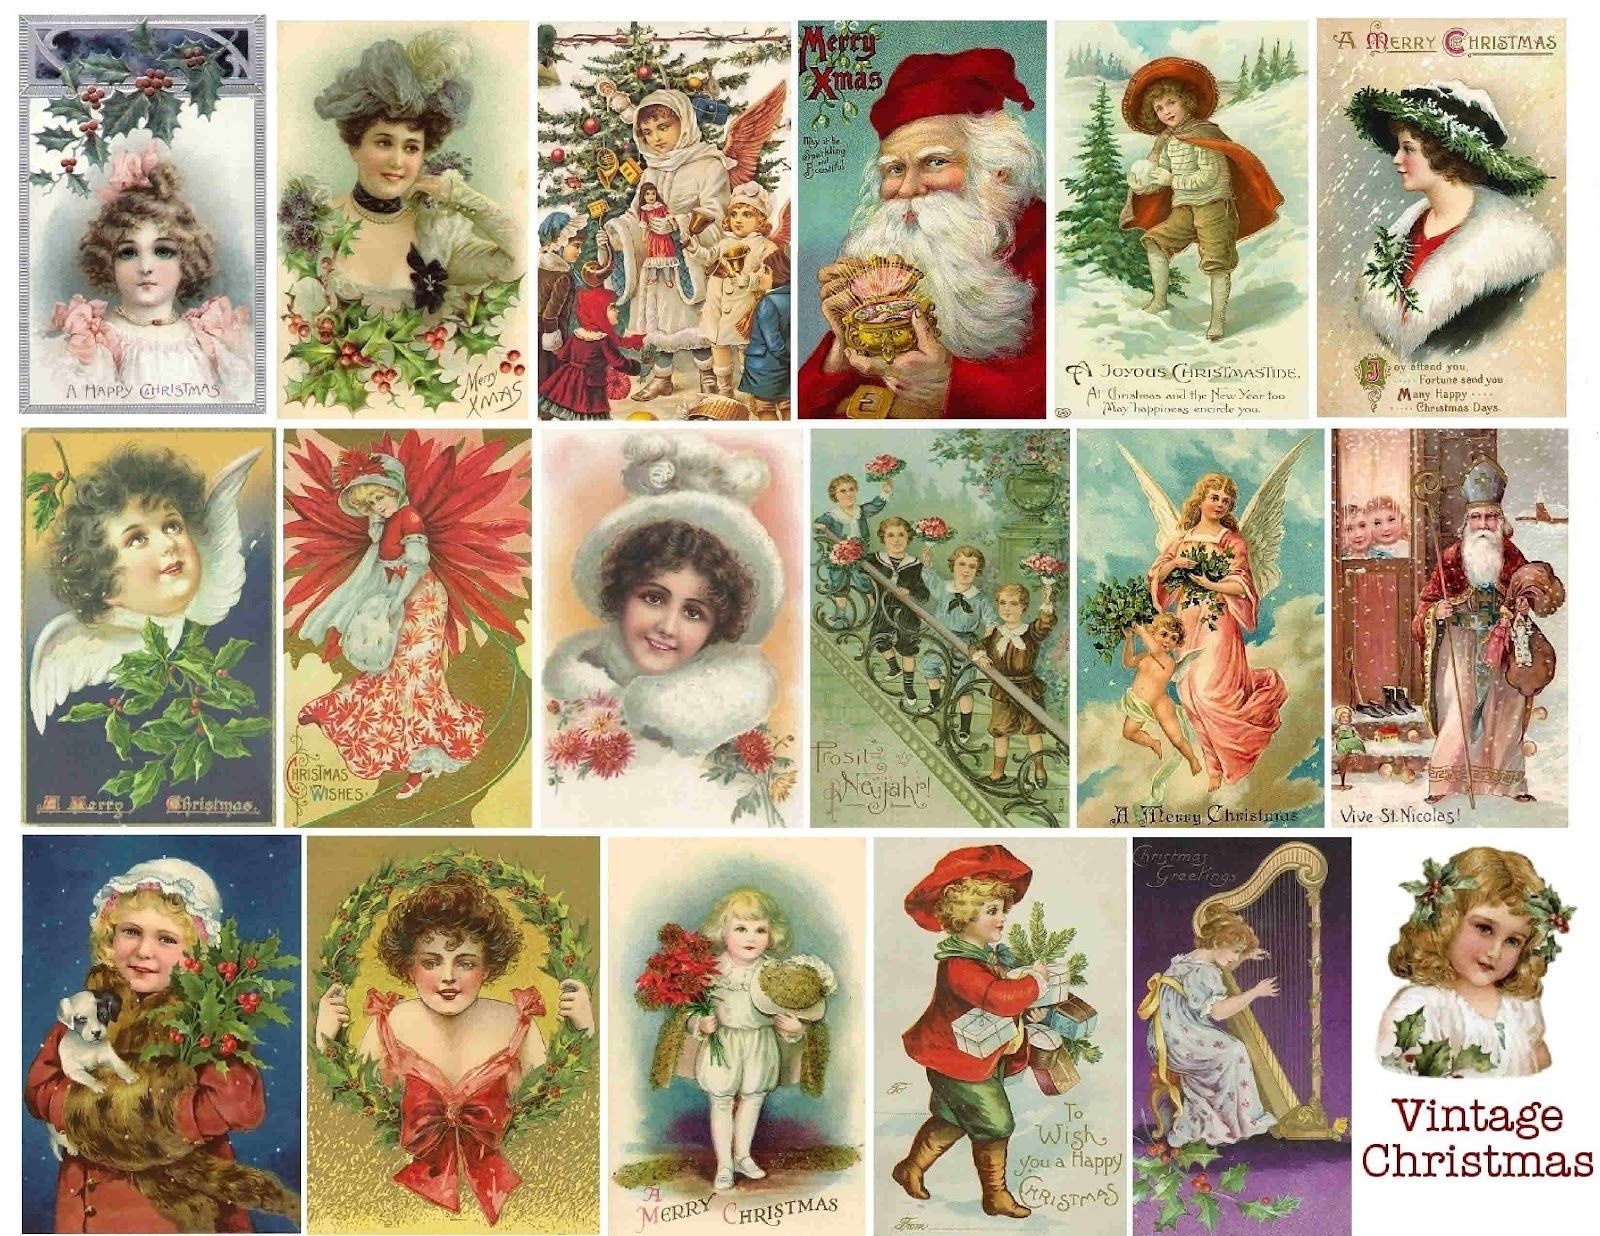 Scrapbook+Christmas+Vintage+Free+Printable | Free Vintage Printable - Free Printable Christmas Photo Collage